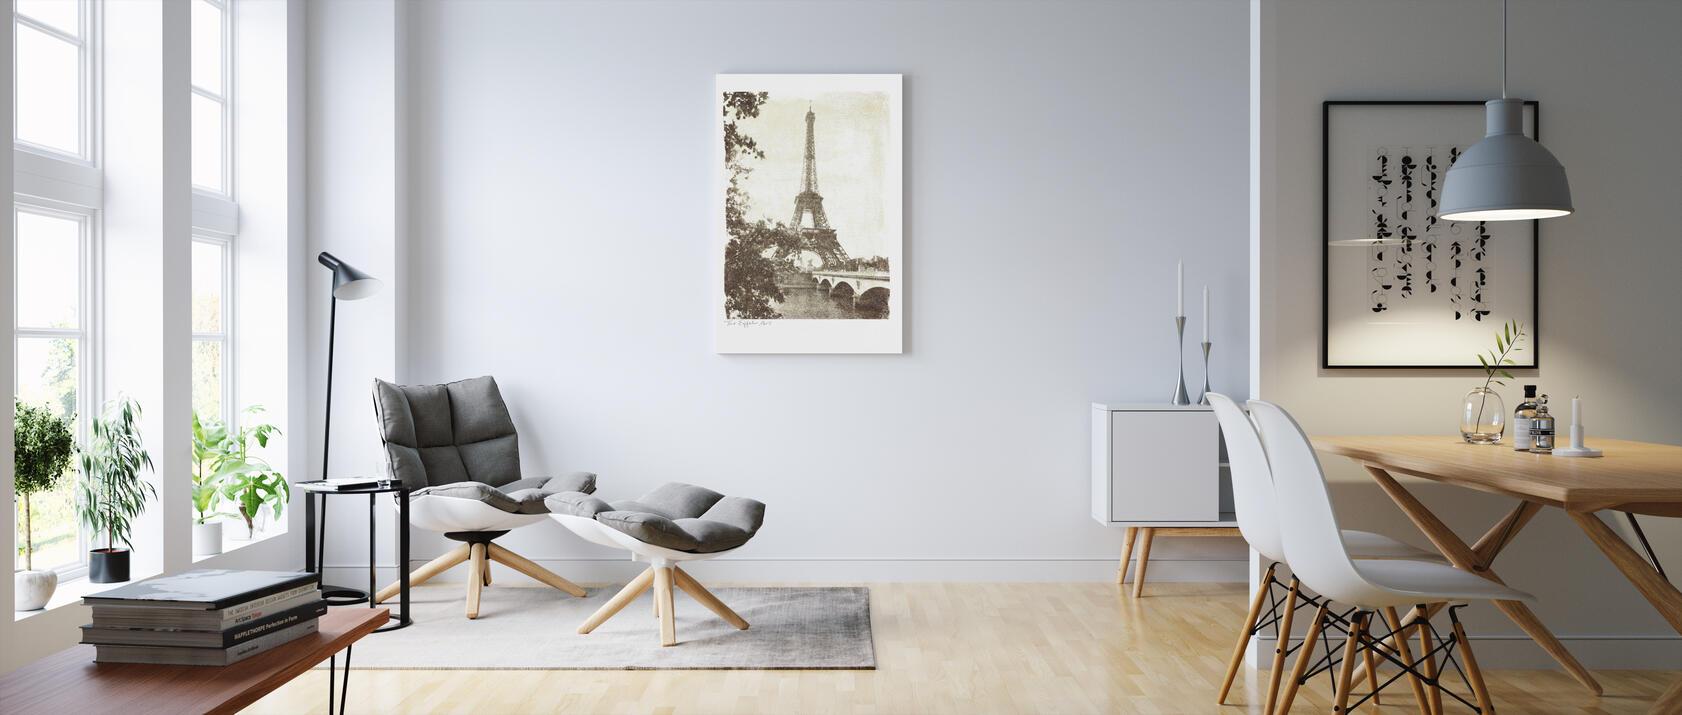 vintage eiffel tower leinwandbilder f r jedes ambiente. Black Bedroom Furniture Sets. Home Design Ideas